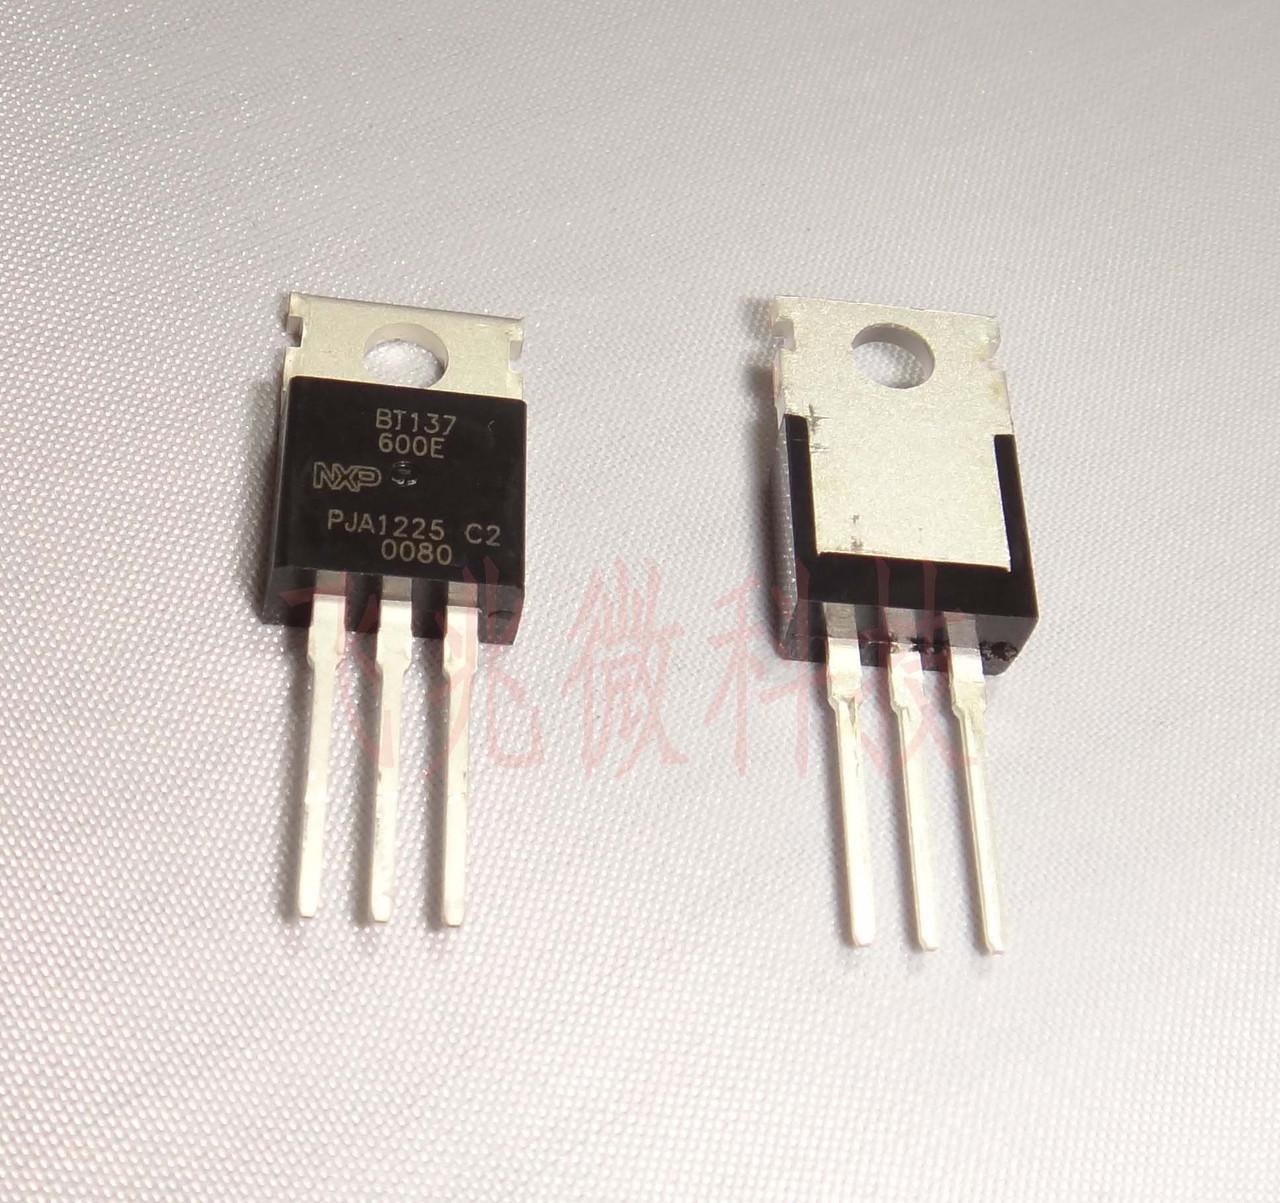 BT137-600E,127, Симистор 8А 600В 10мА, TO-220AB